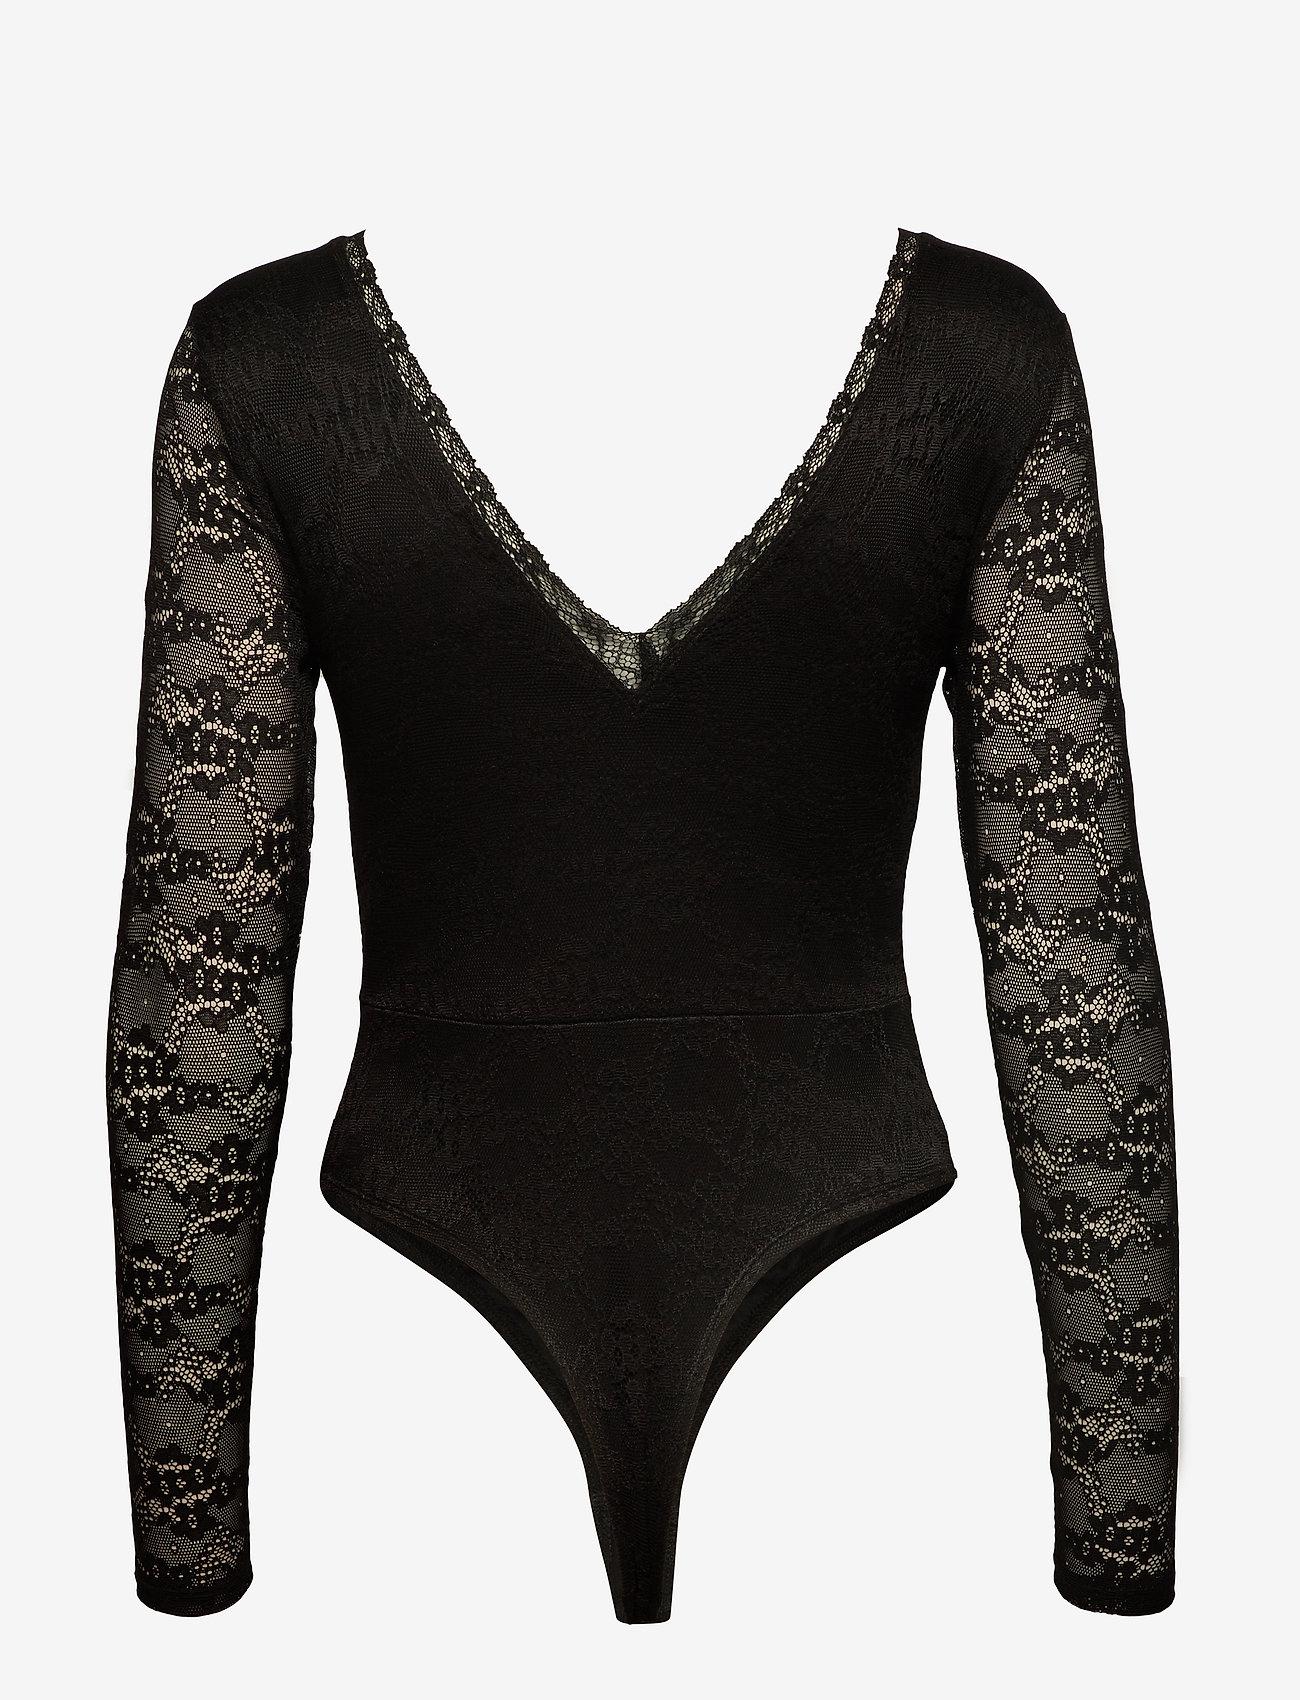 Ivyrevel - DEEP V LACE BODY - body - black - 1